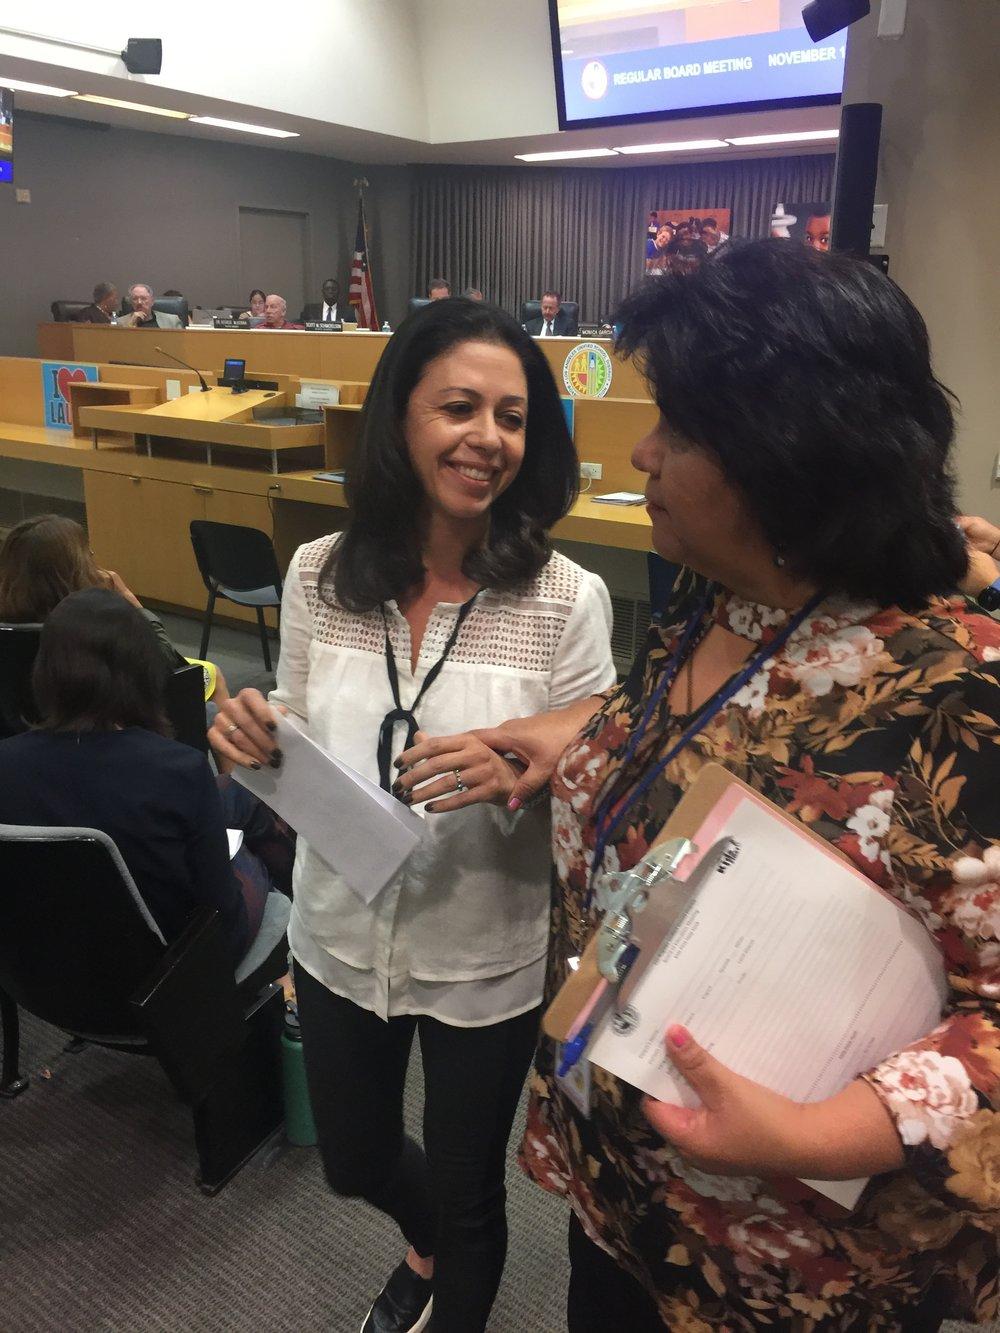 Speak UP's Daphne Radfar asks LAUSD to be more transparent with parents